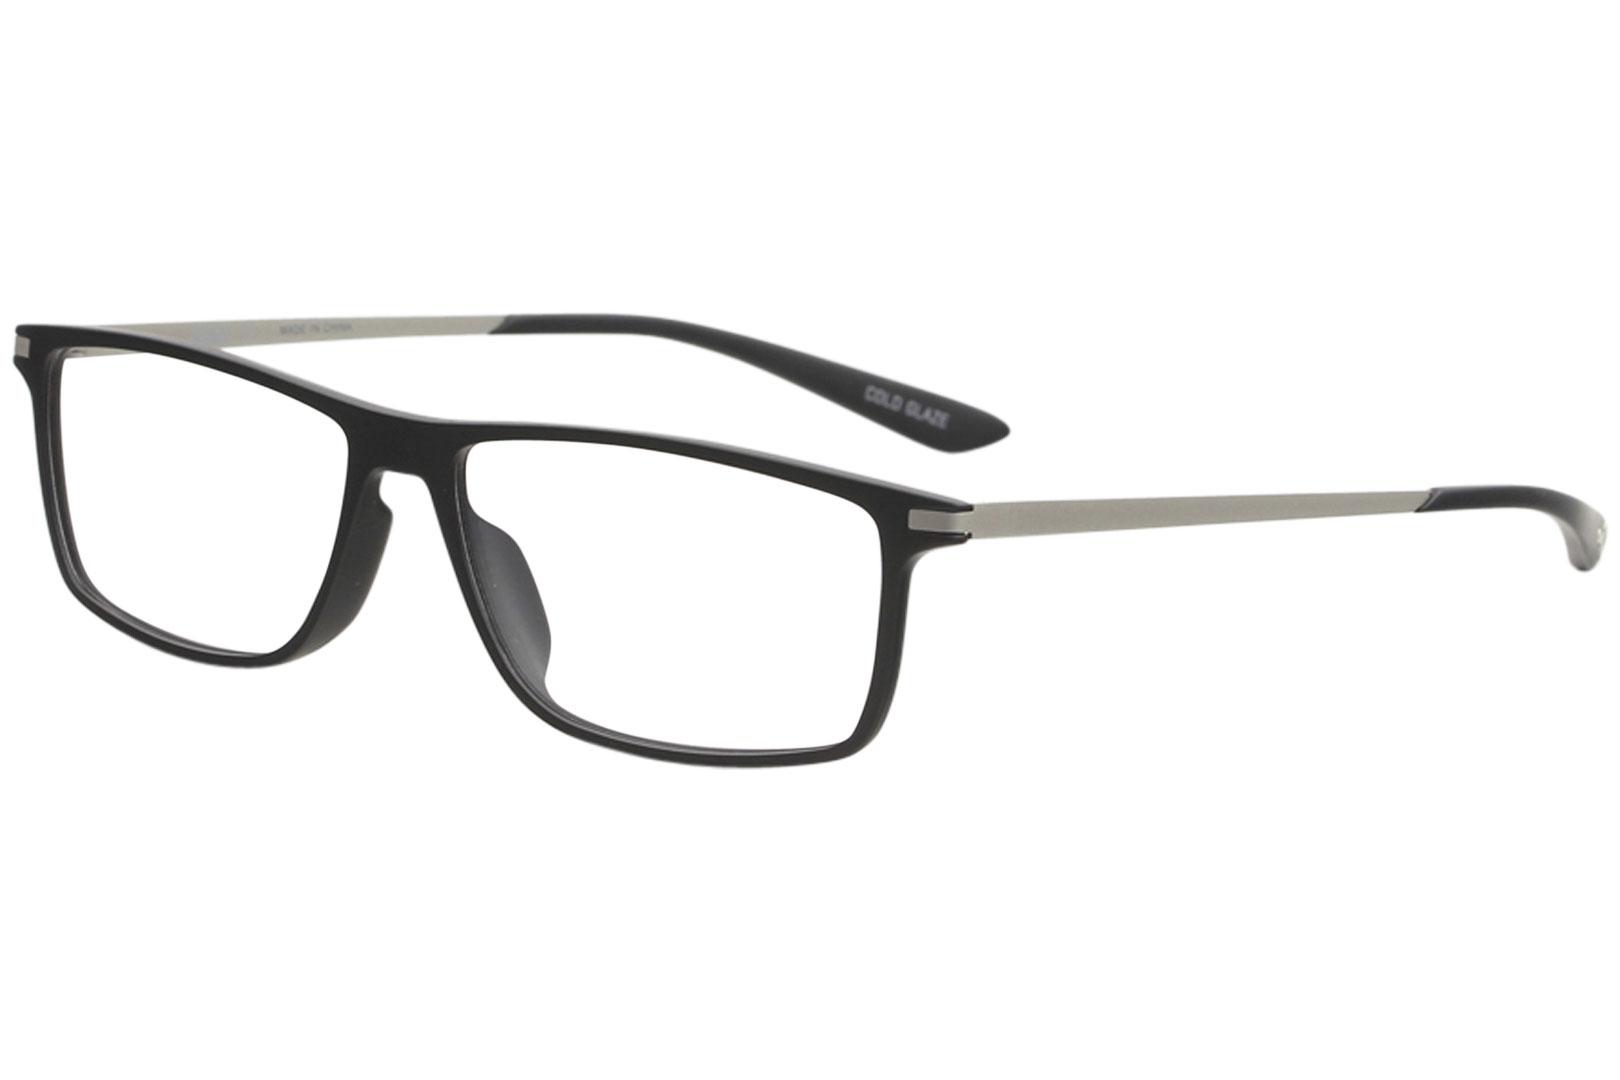 1f3608e3bb25 Puma Eyeglasses 005 PU0115O PU/0115/O Black/Silver Full Rim Optical ...